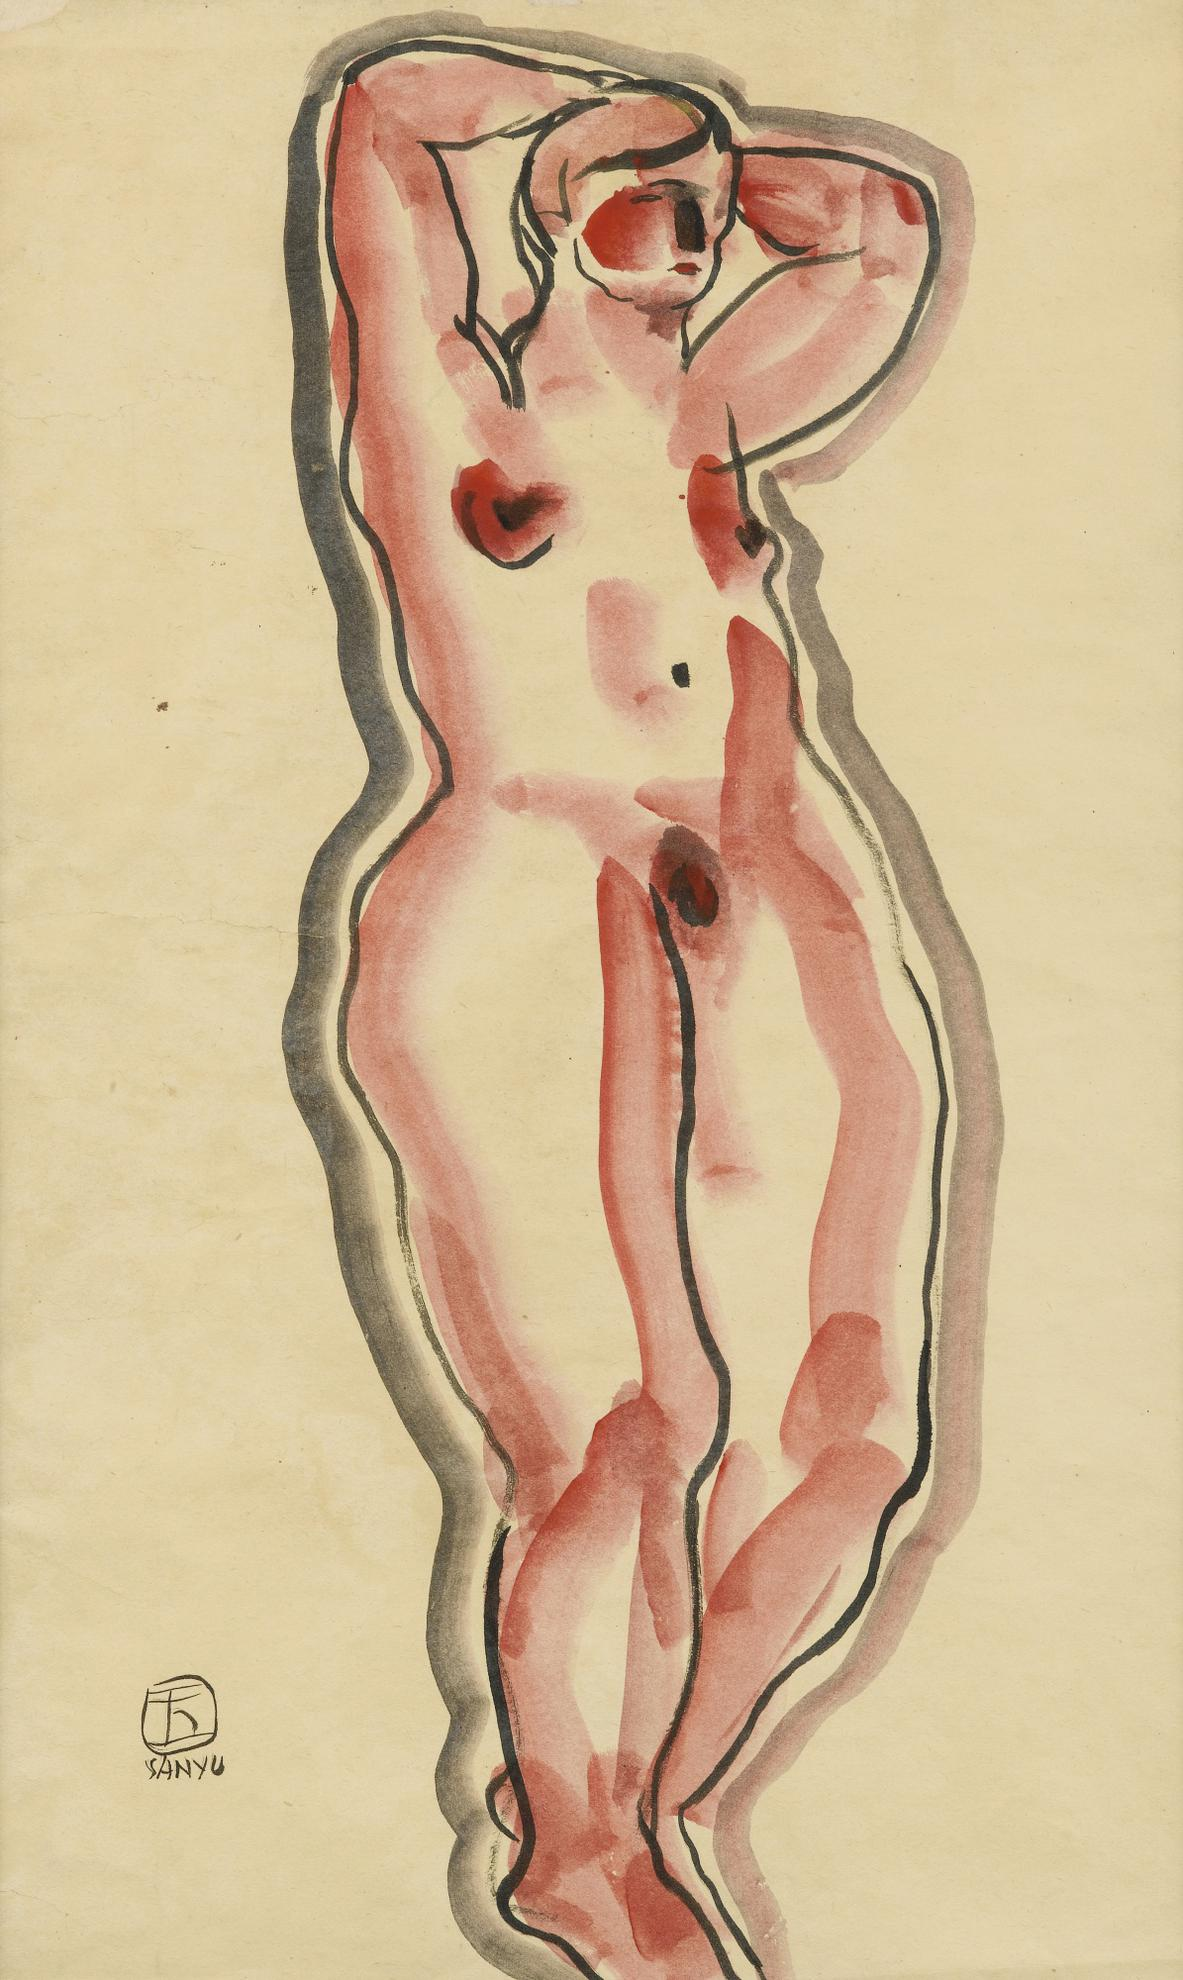 Sanyu-Femme Aux Bras Leves-1930